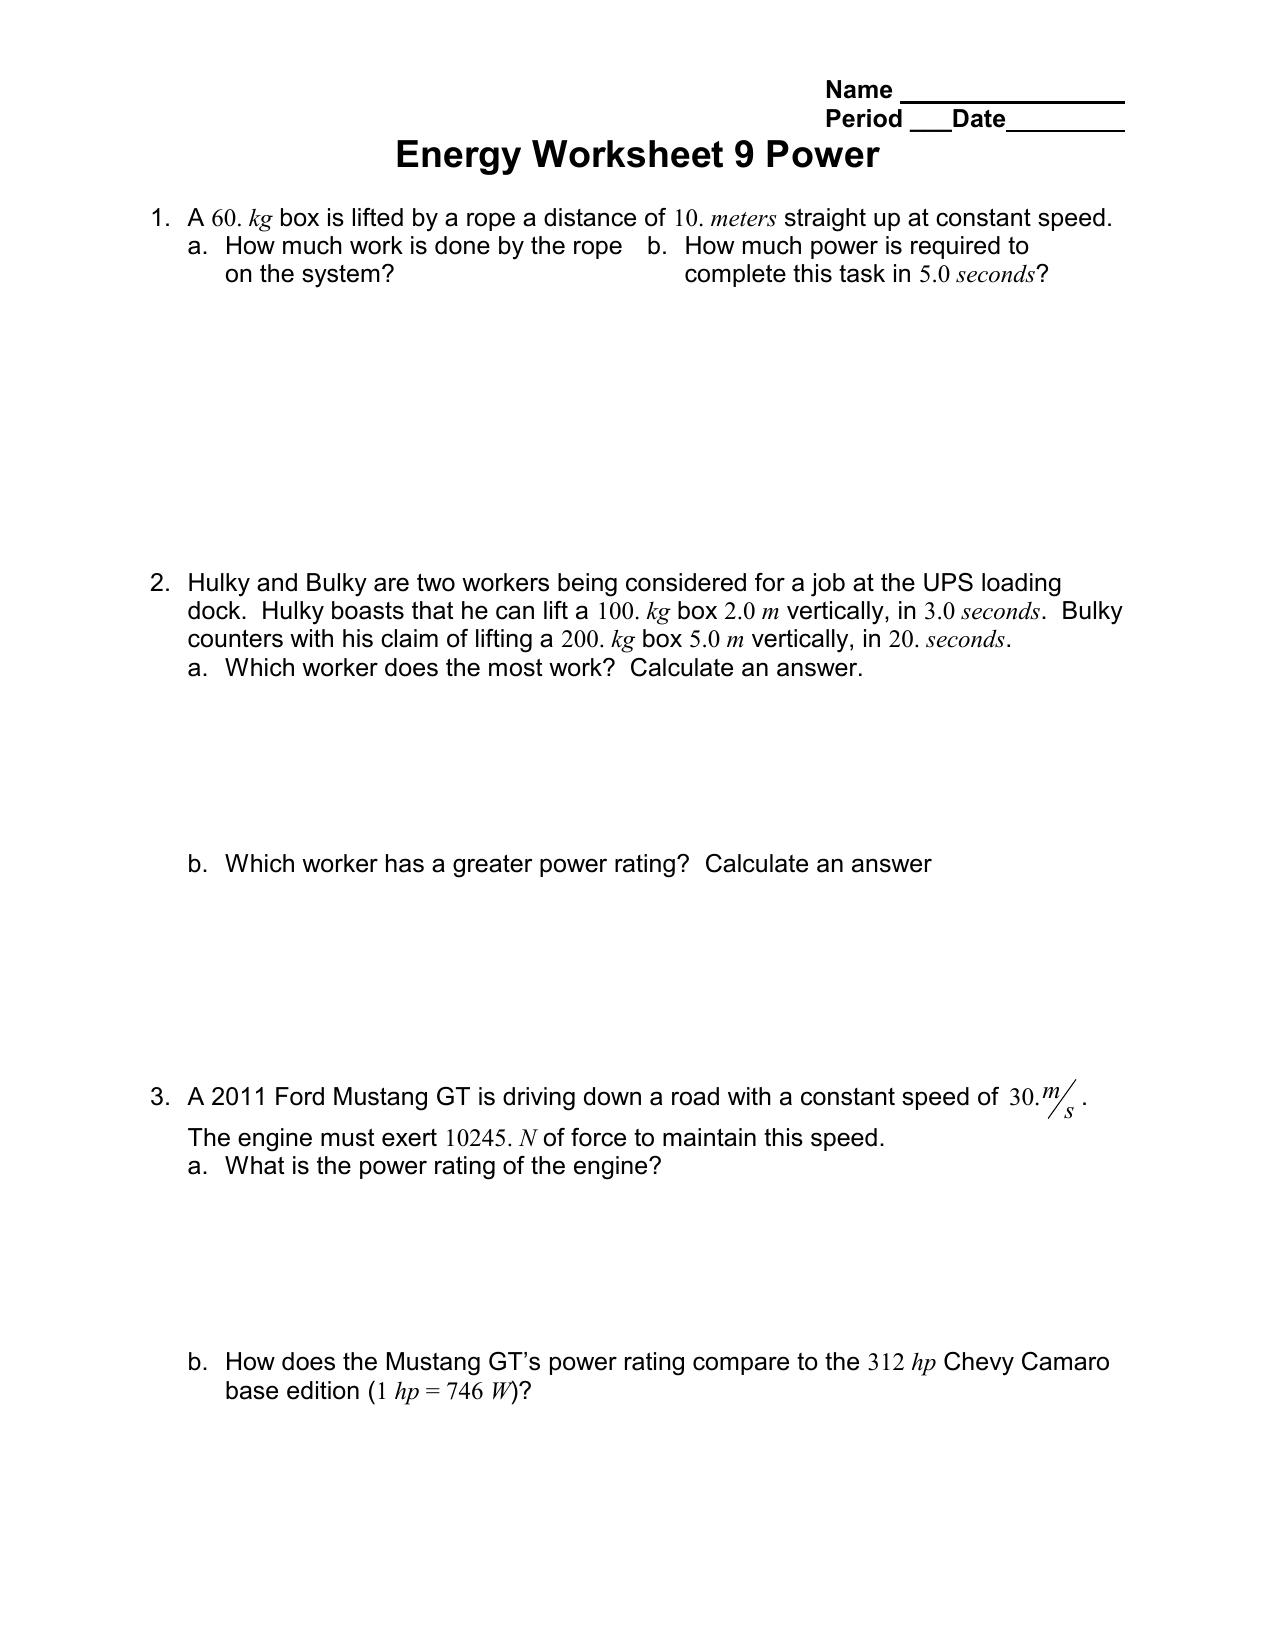 Energy Worksheet 9 Power